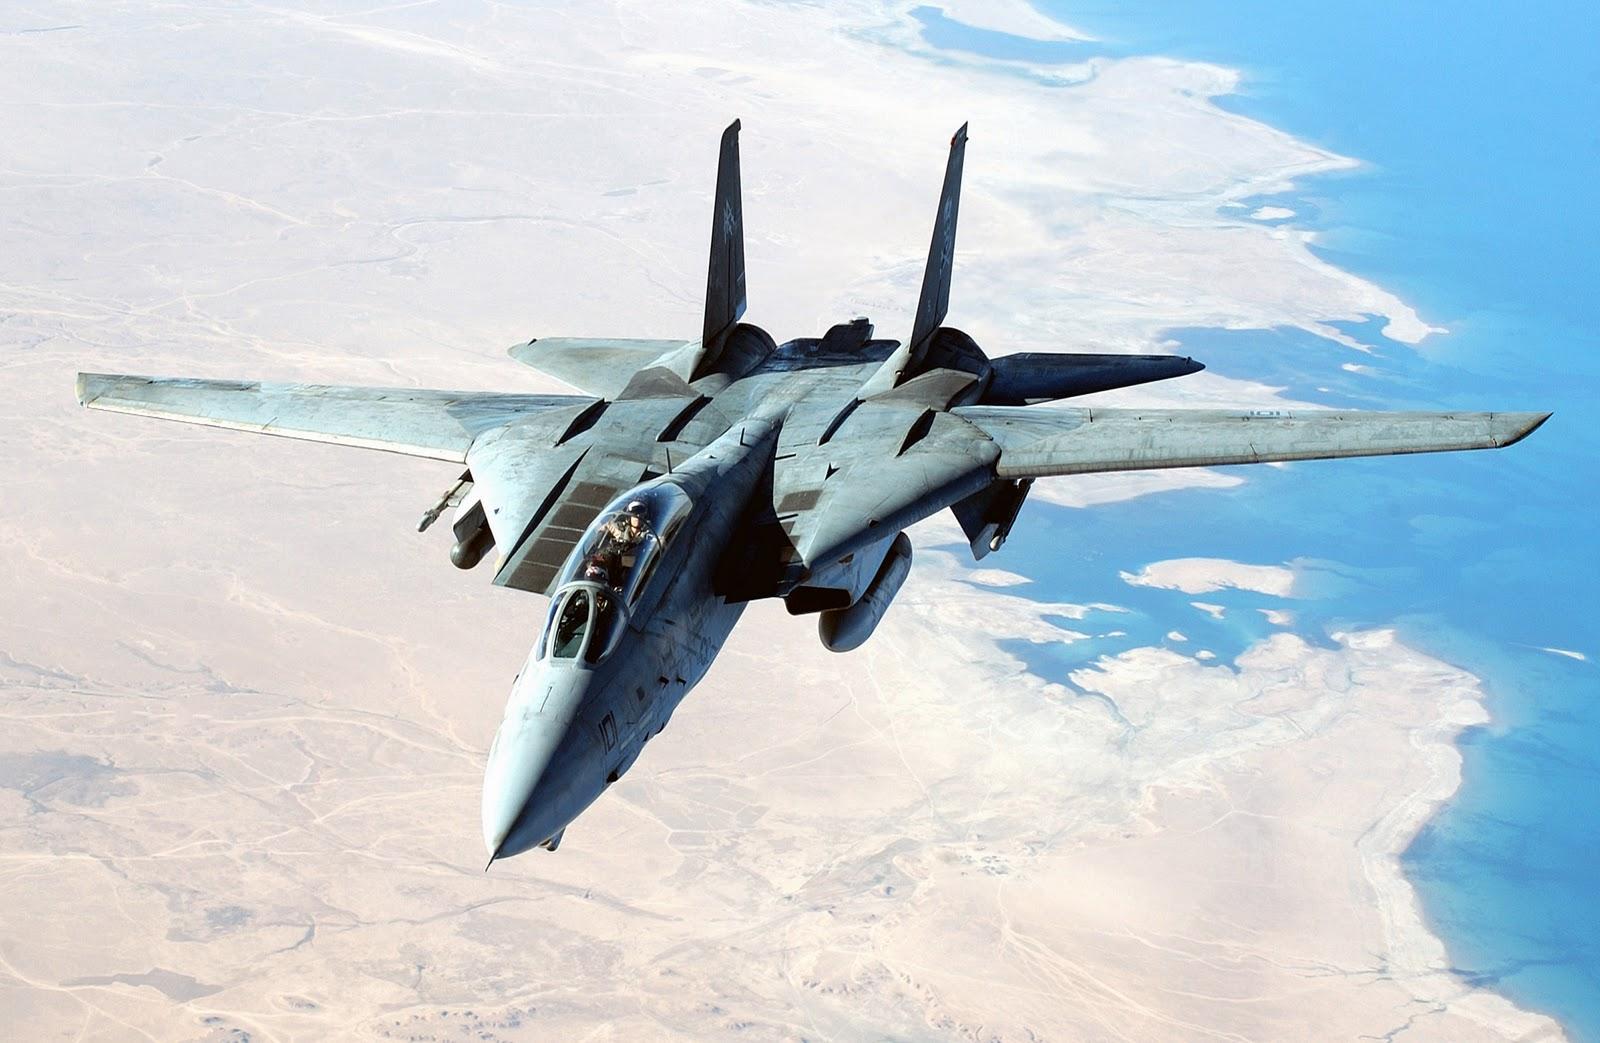 14 tomcat jet fighter - photo #3